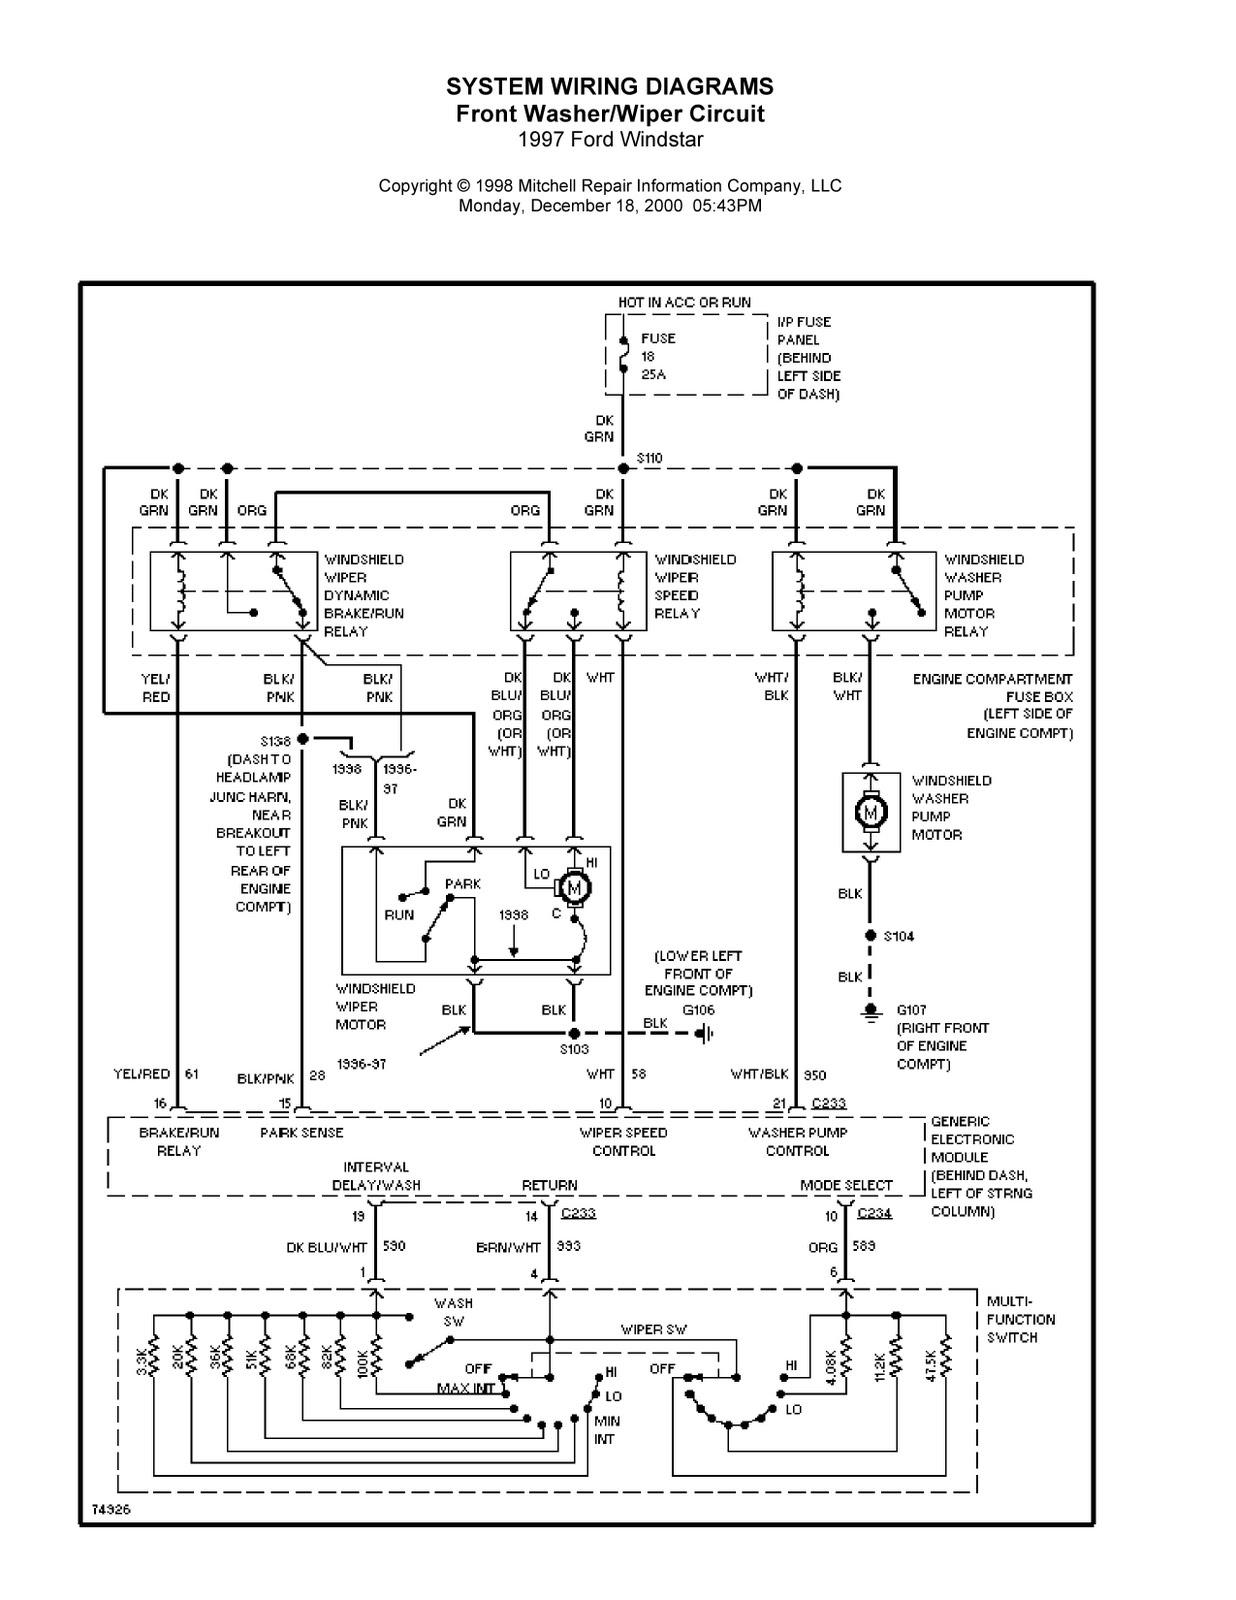 2001 ford windstar radio wiring diagram nema 14 30 for fuse box get free image